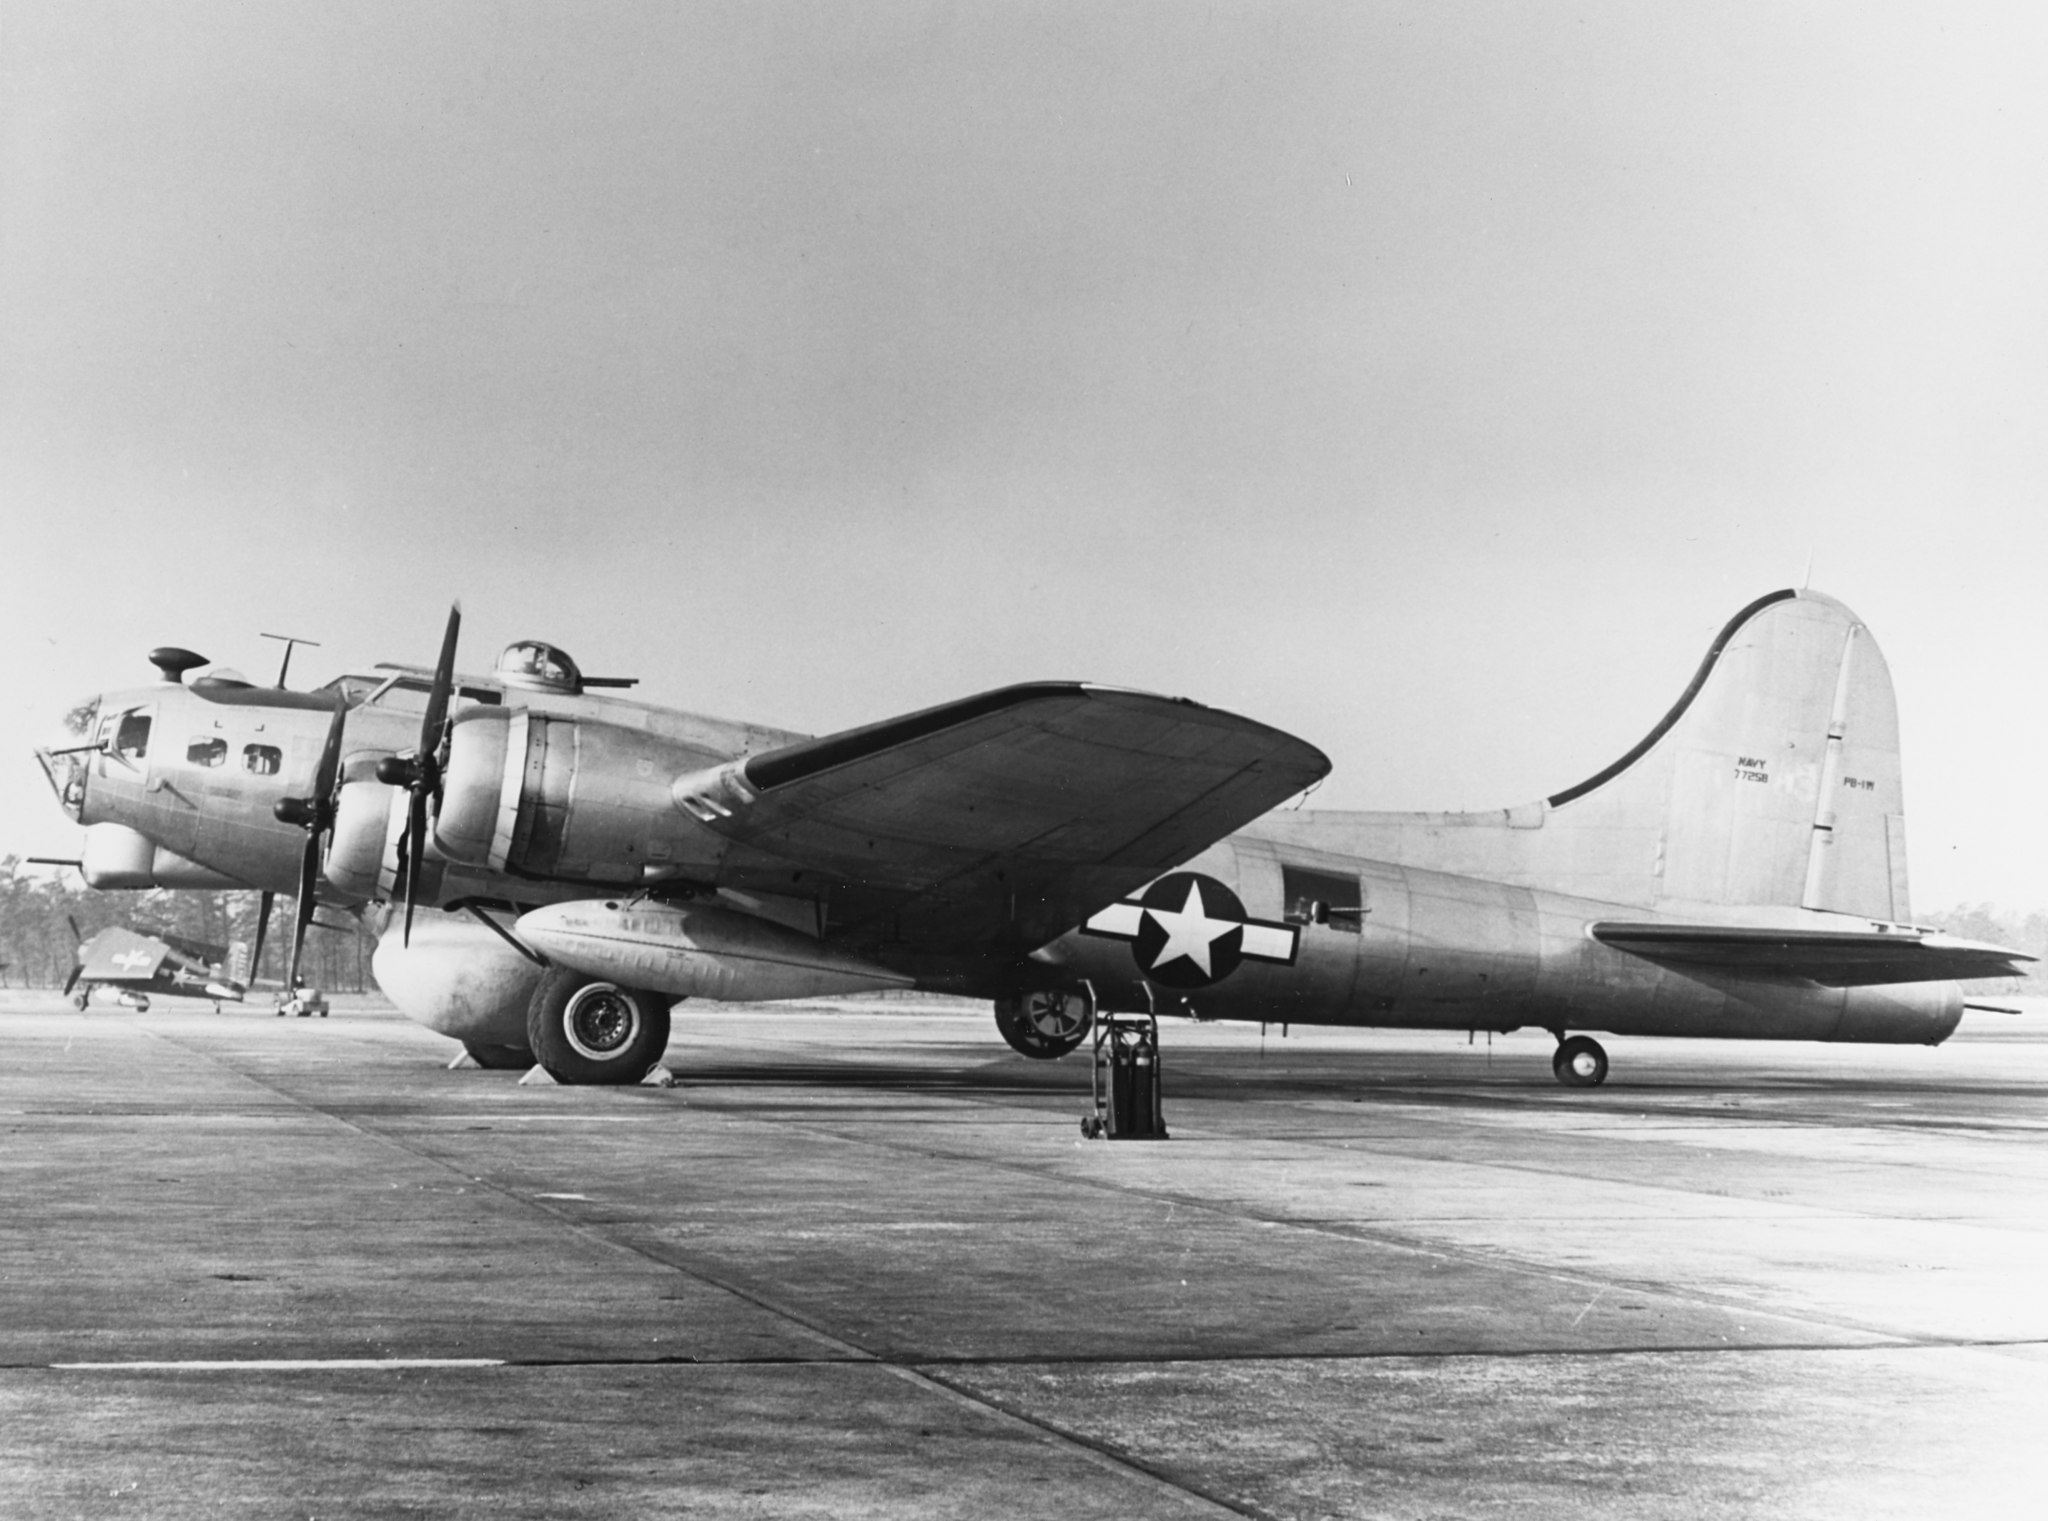 B-17 #44-85683